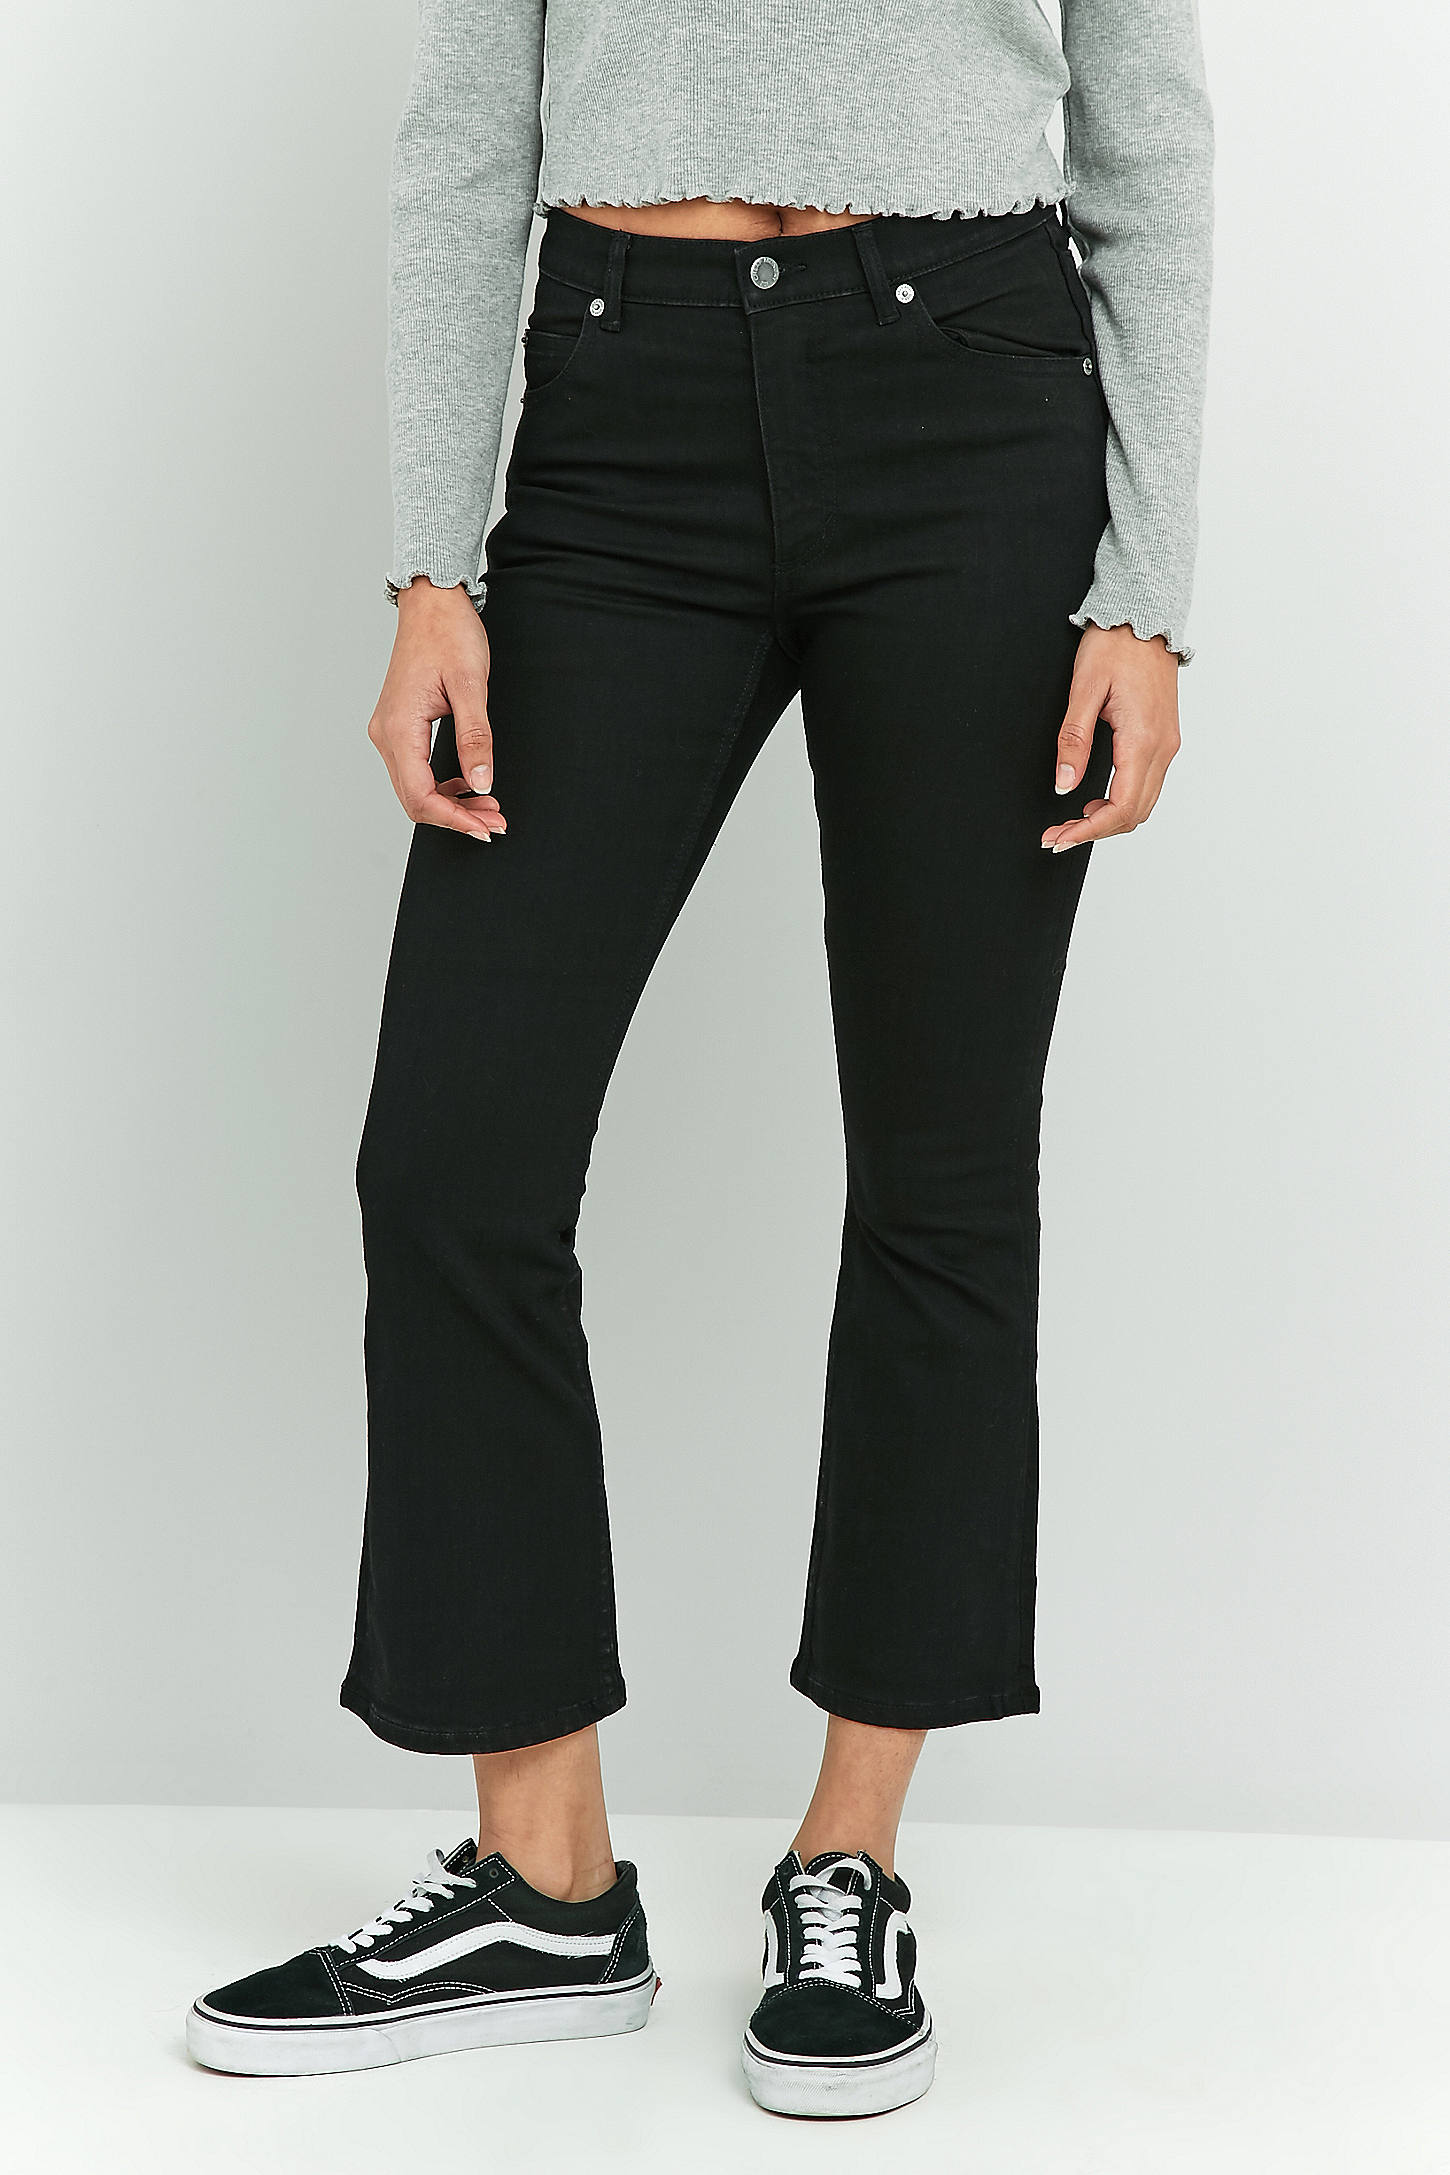 Cheap Monday Black Drift Kick Flare Jeans | Urban Outfitters